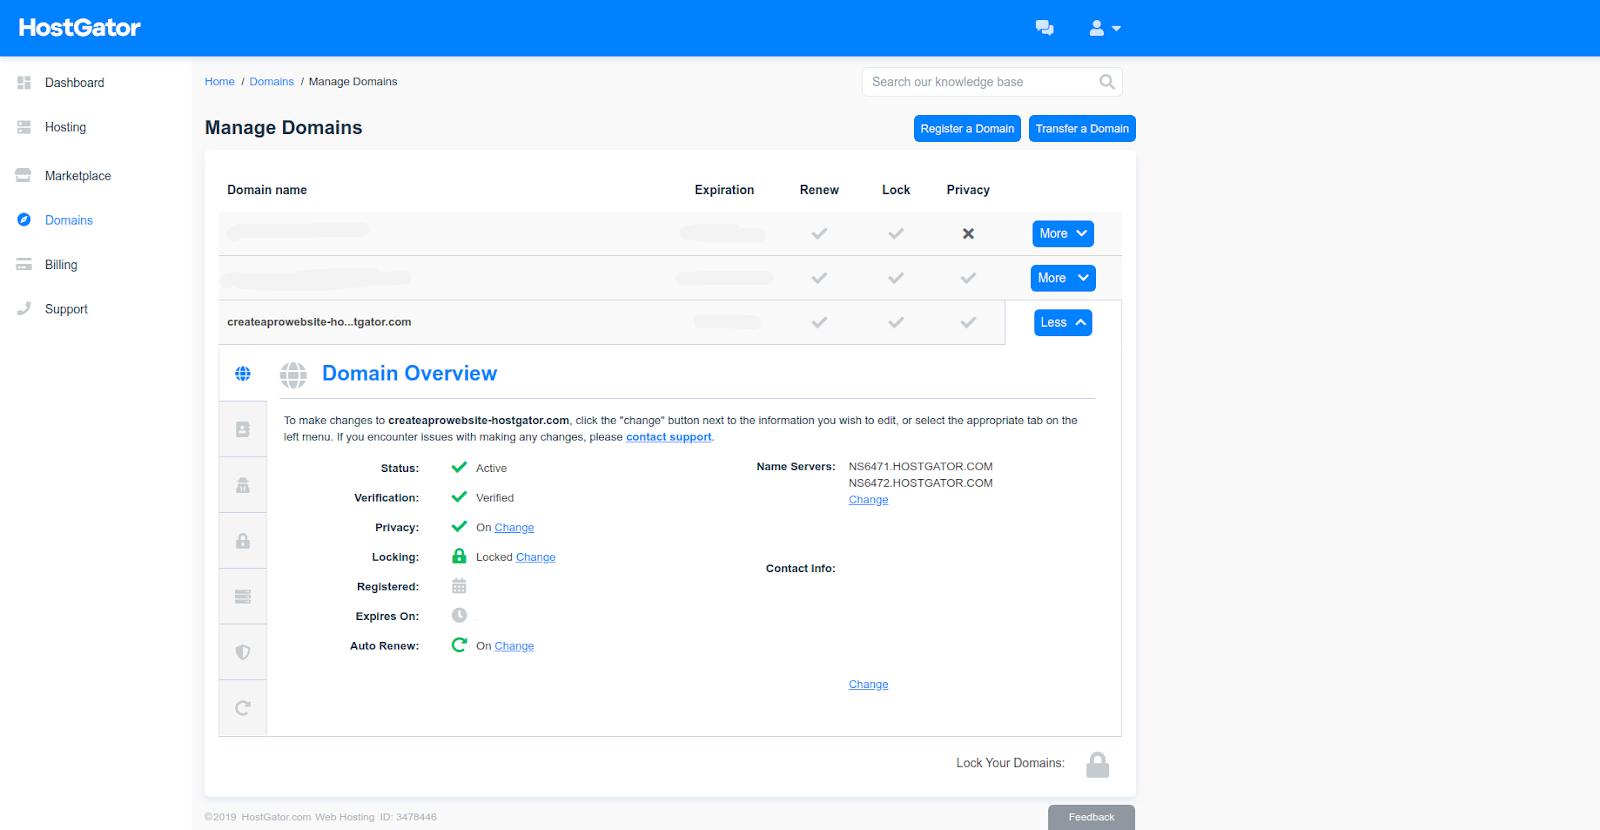 hostgator domain hosting portal